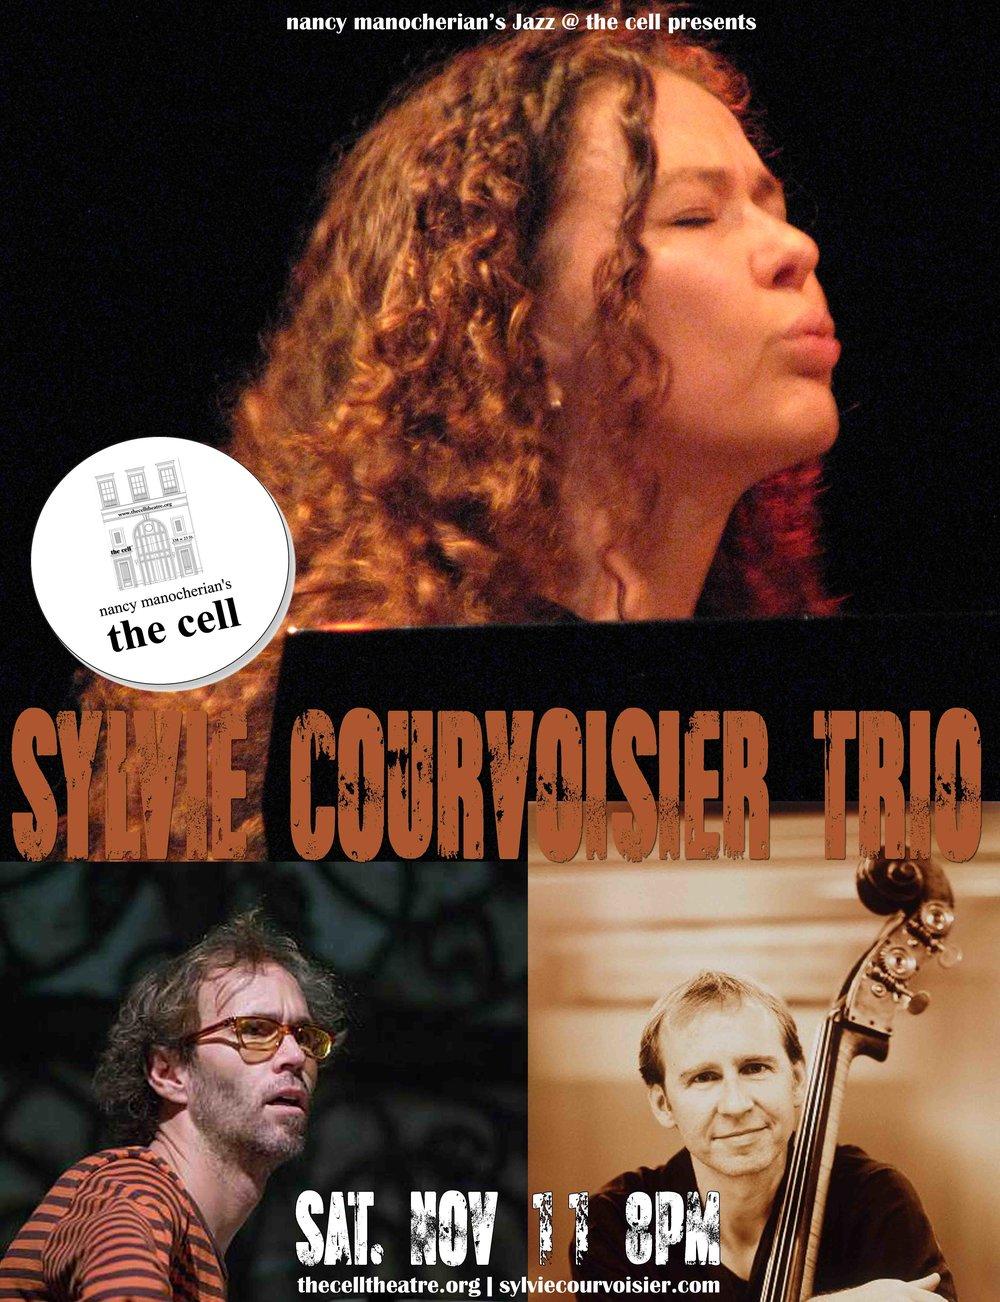 Sylvie courvoisier trio Nov 11 web.jpg